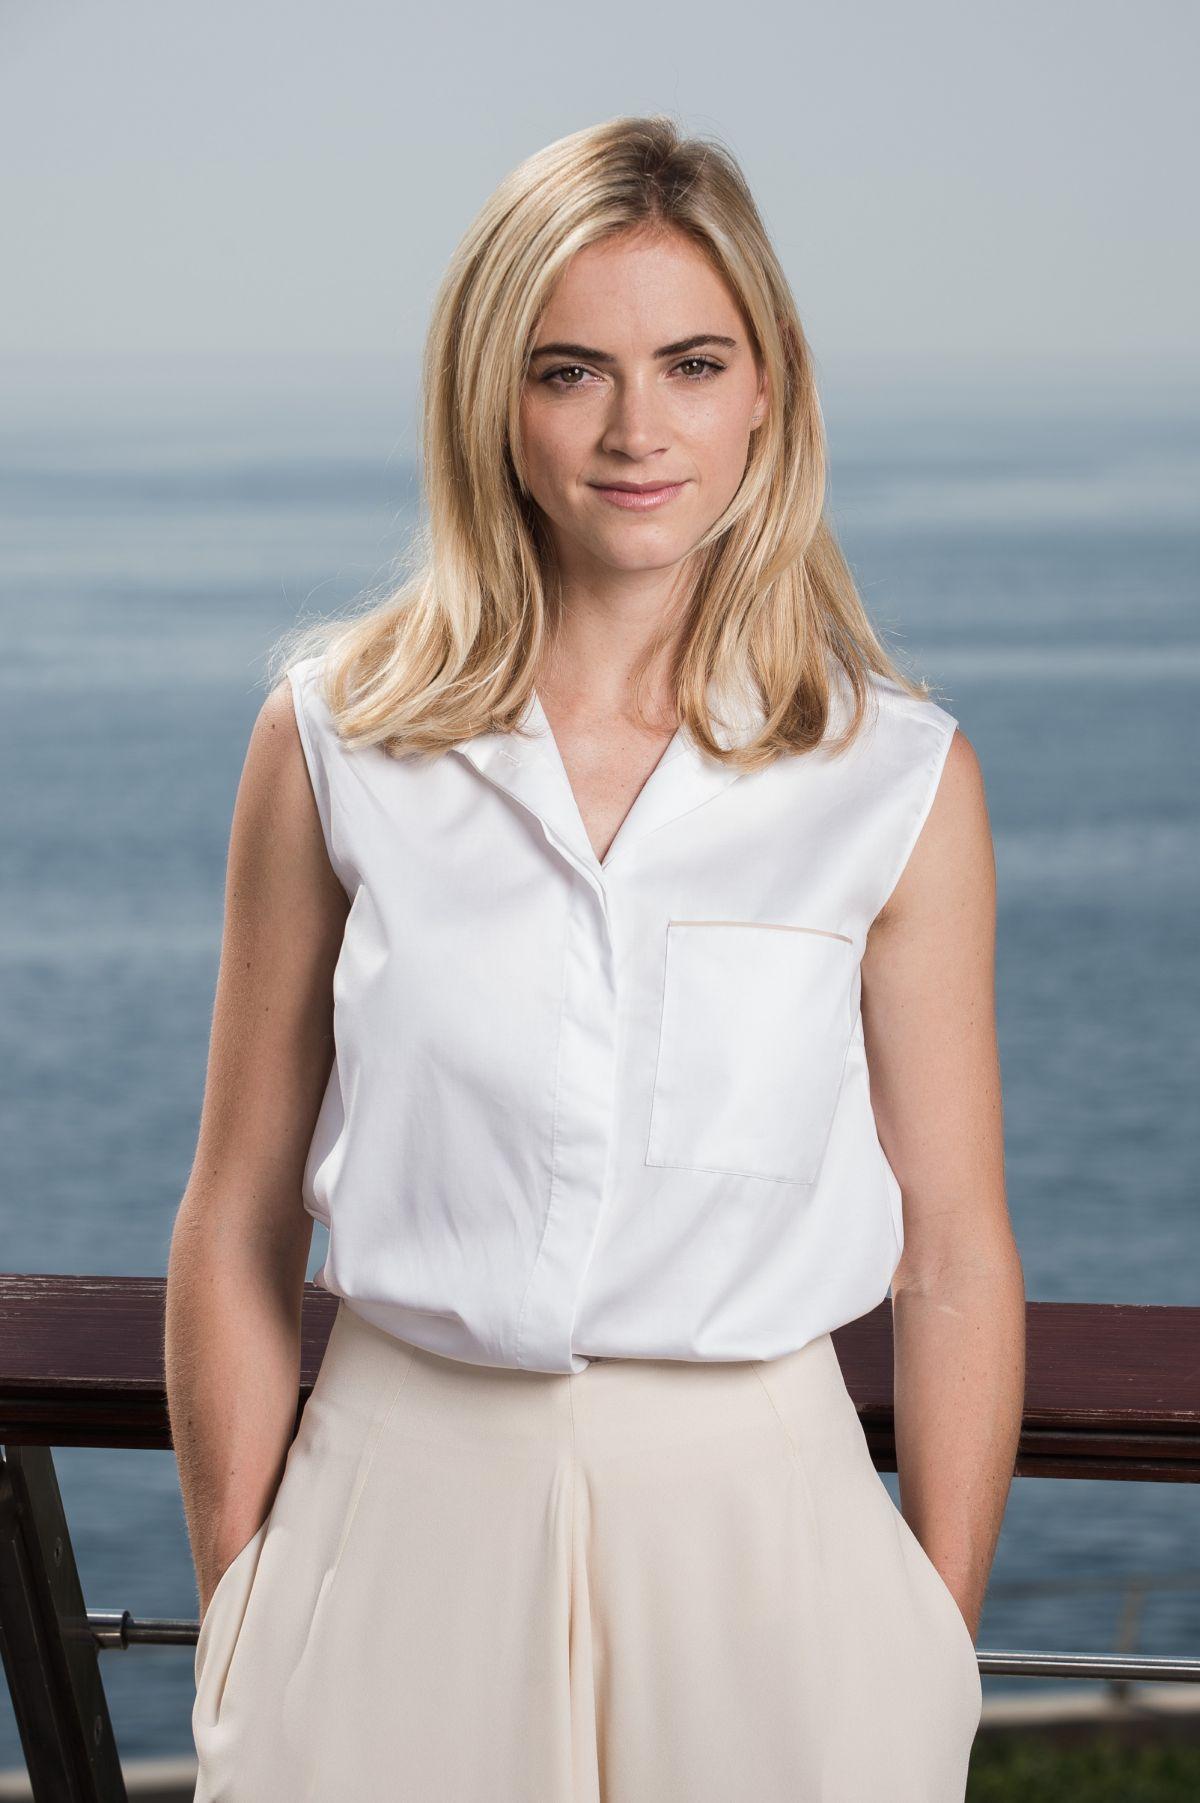 EMILY WICKERSHAM at 2014 Monte Carlo TV Festival